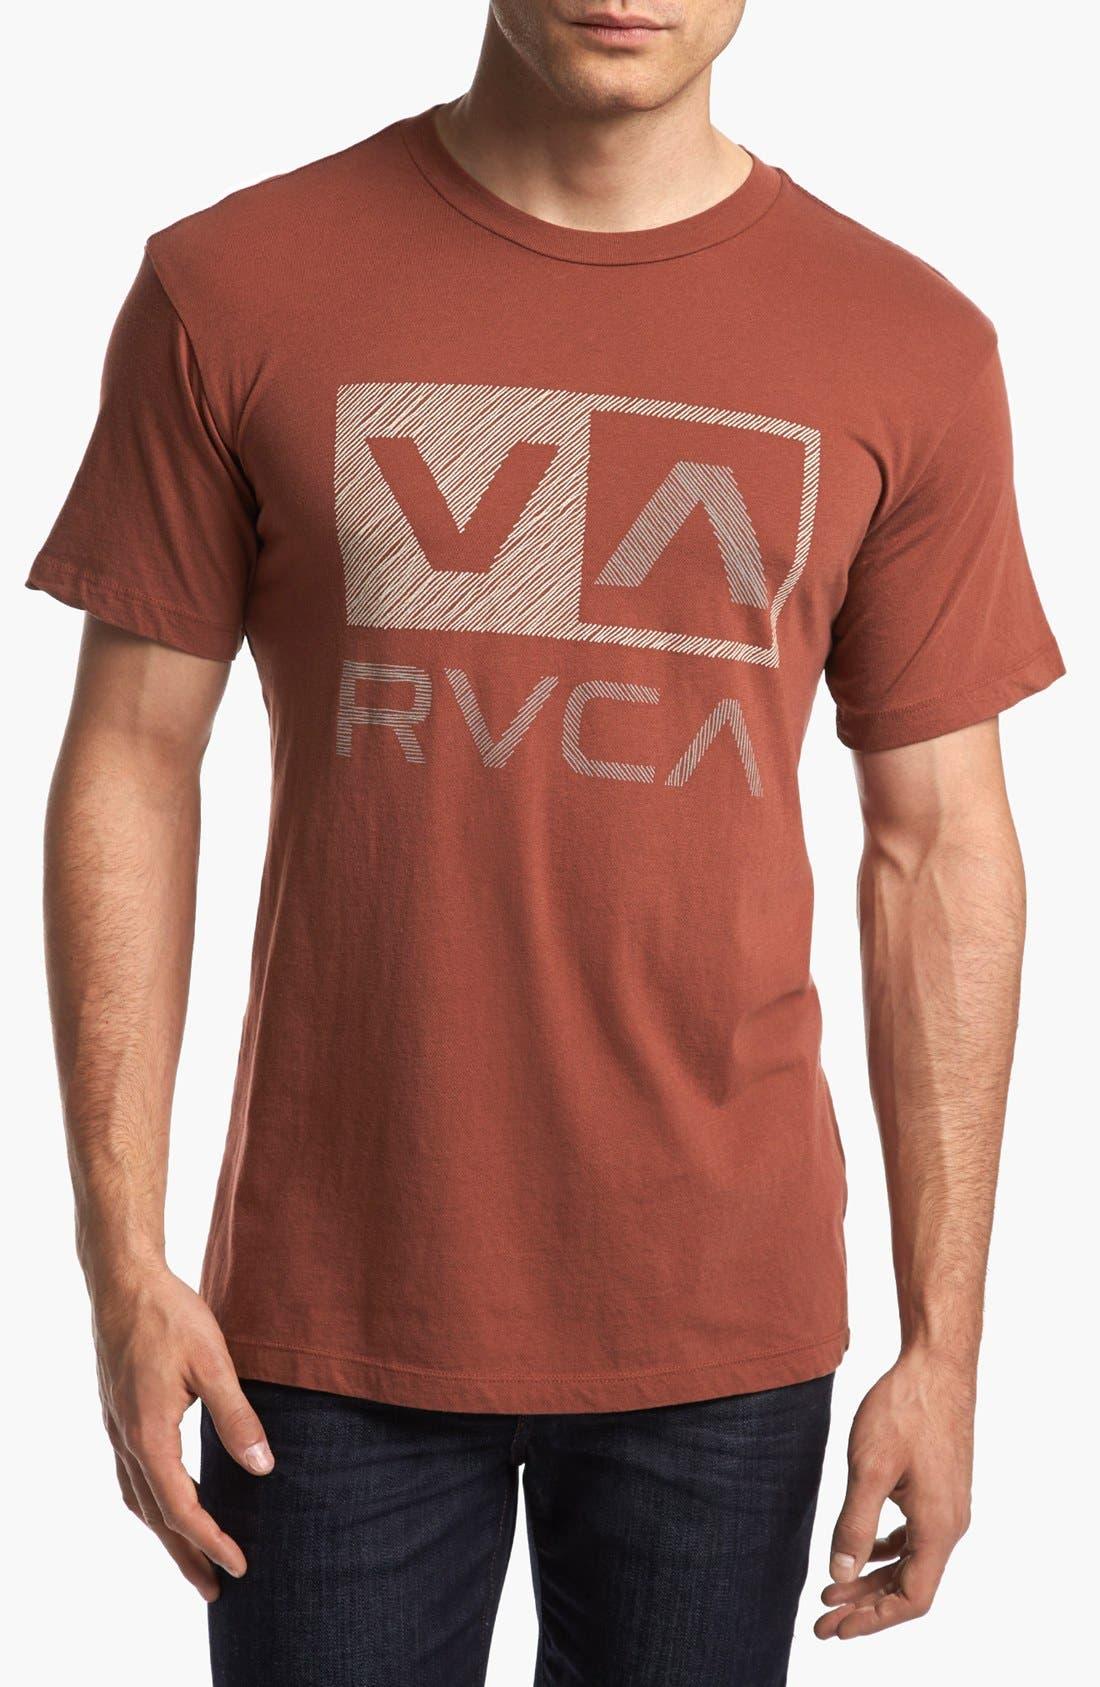 Alternate Image 1 Selected - RVCA 'Sketch Box' T-Shirt